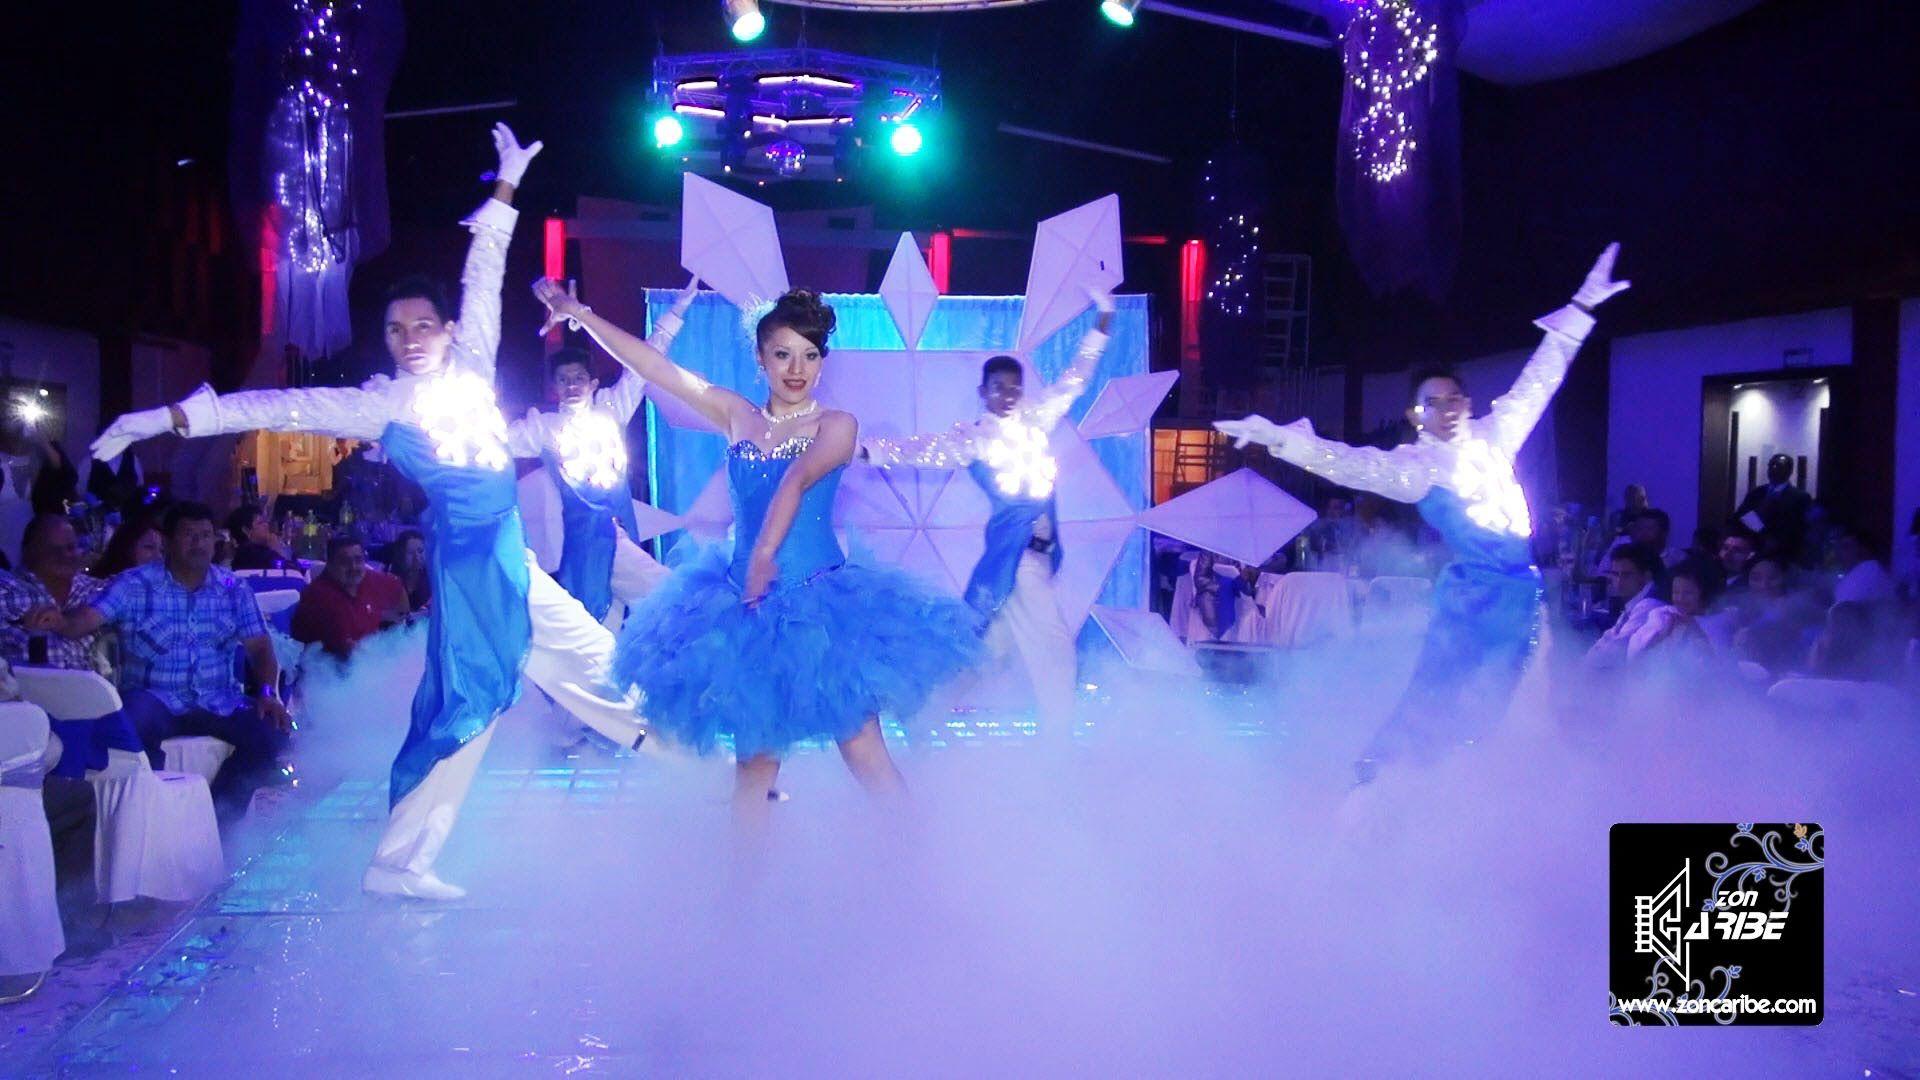 XV Años Lupita Vals Moderno Frozen Academias de Baile Perfiles Foto ...